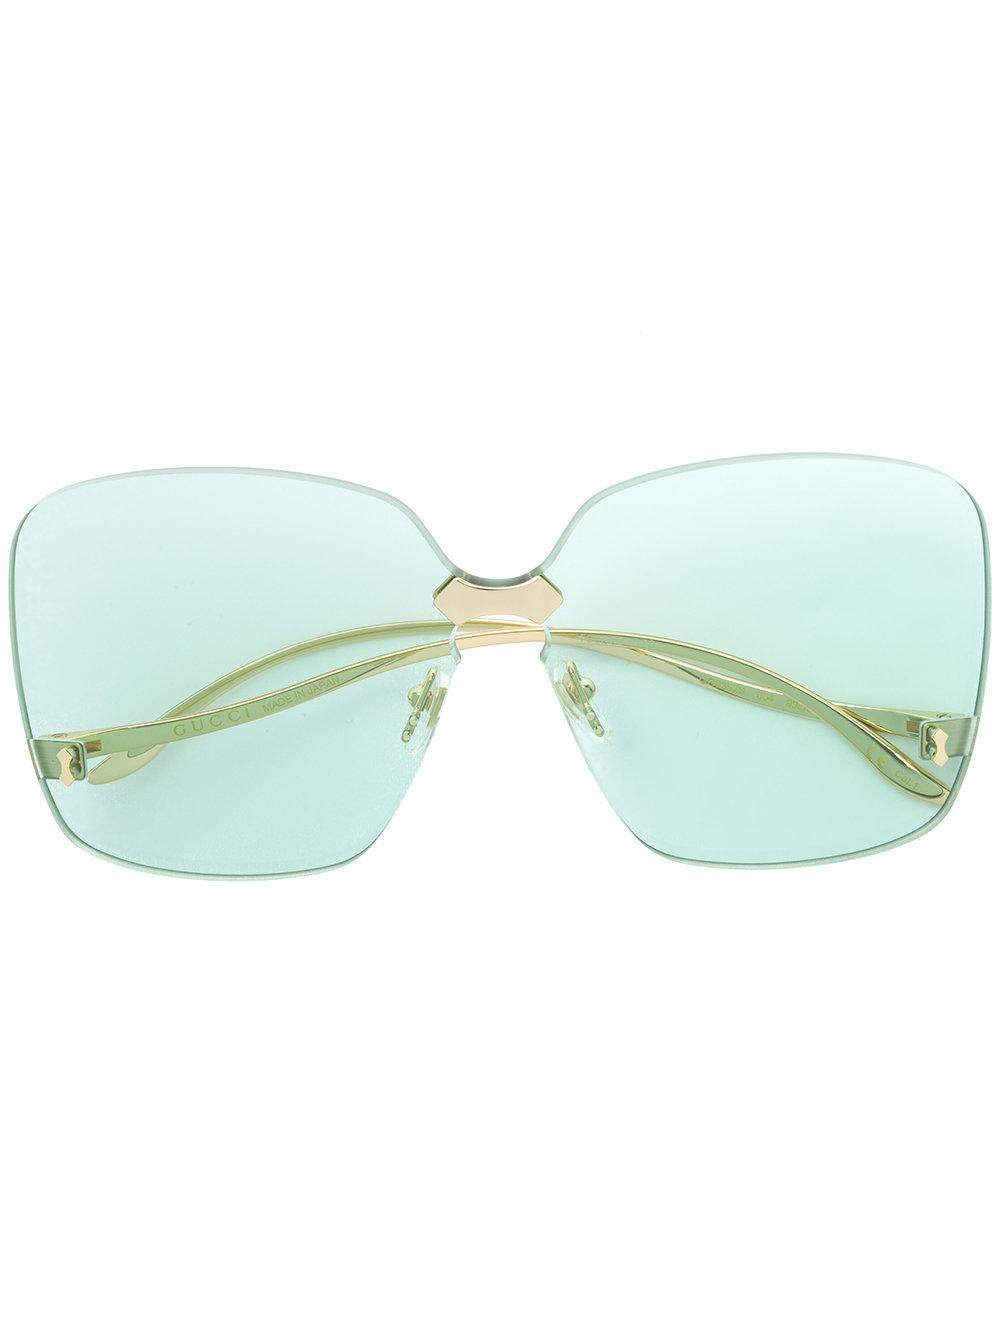 a19fbd15701 Gucci Eyewear Square Frame Rimless Sunglasses - Metallic